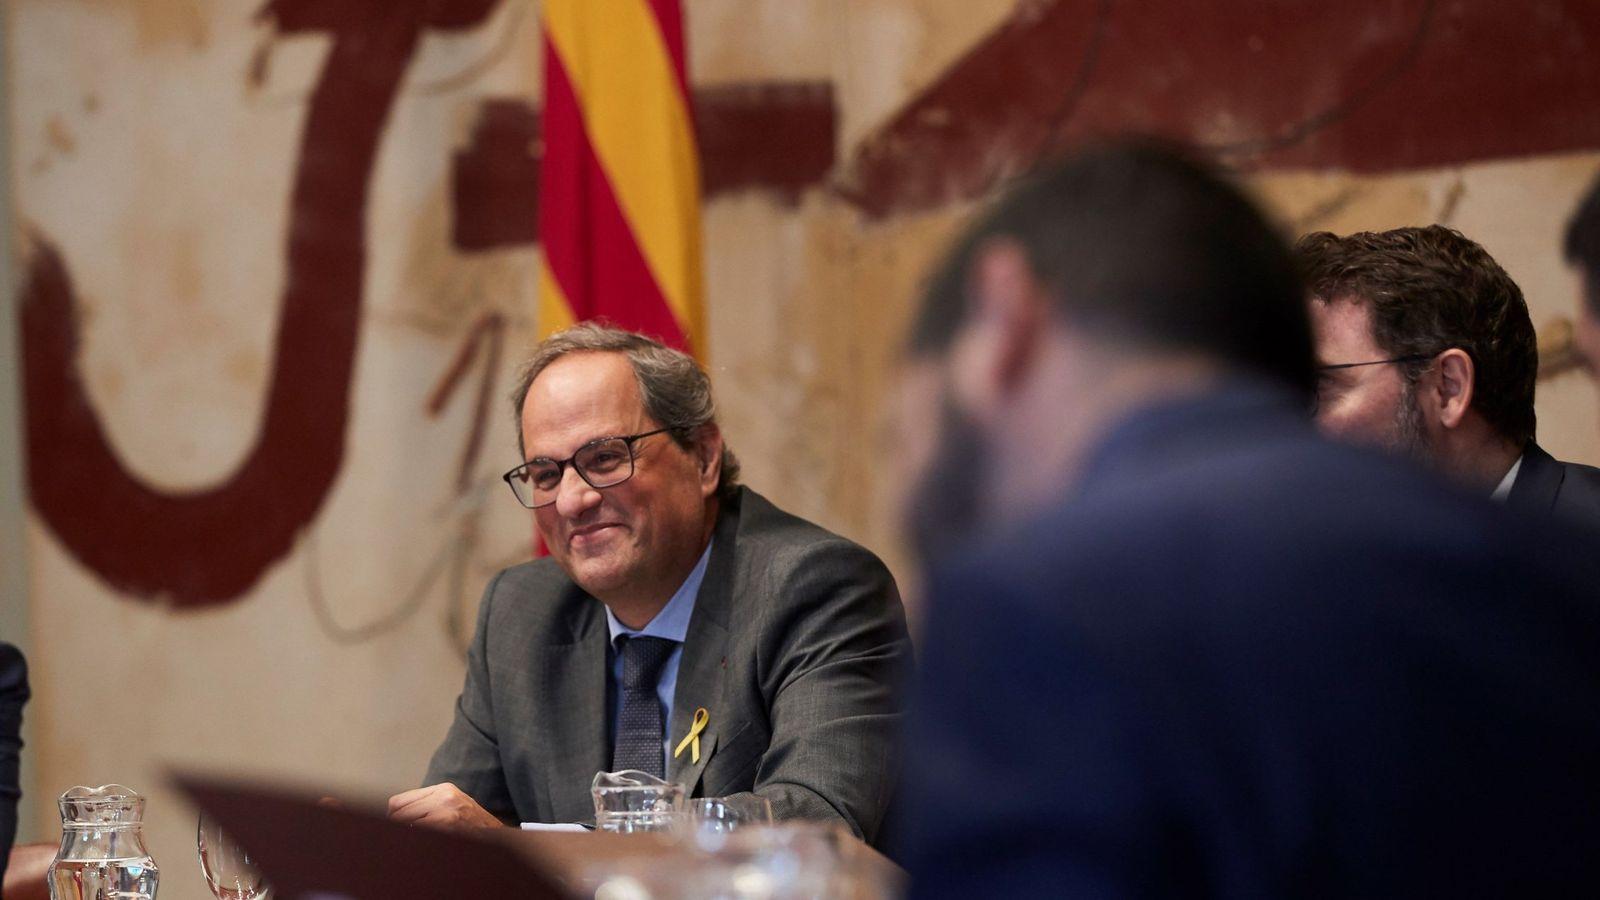 Foto: El presidente de la Generalitat, Quim Torra, en una reunión del Ejecutivo que lidera. (EFE)